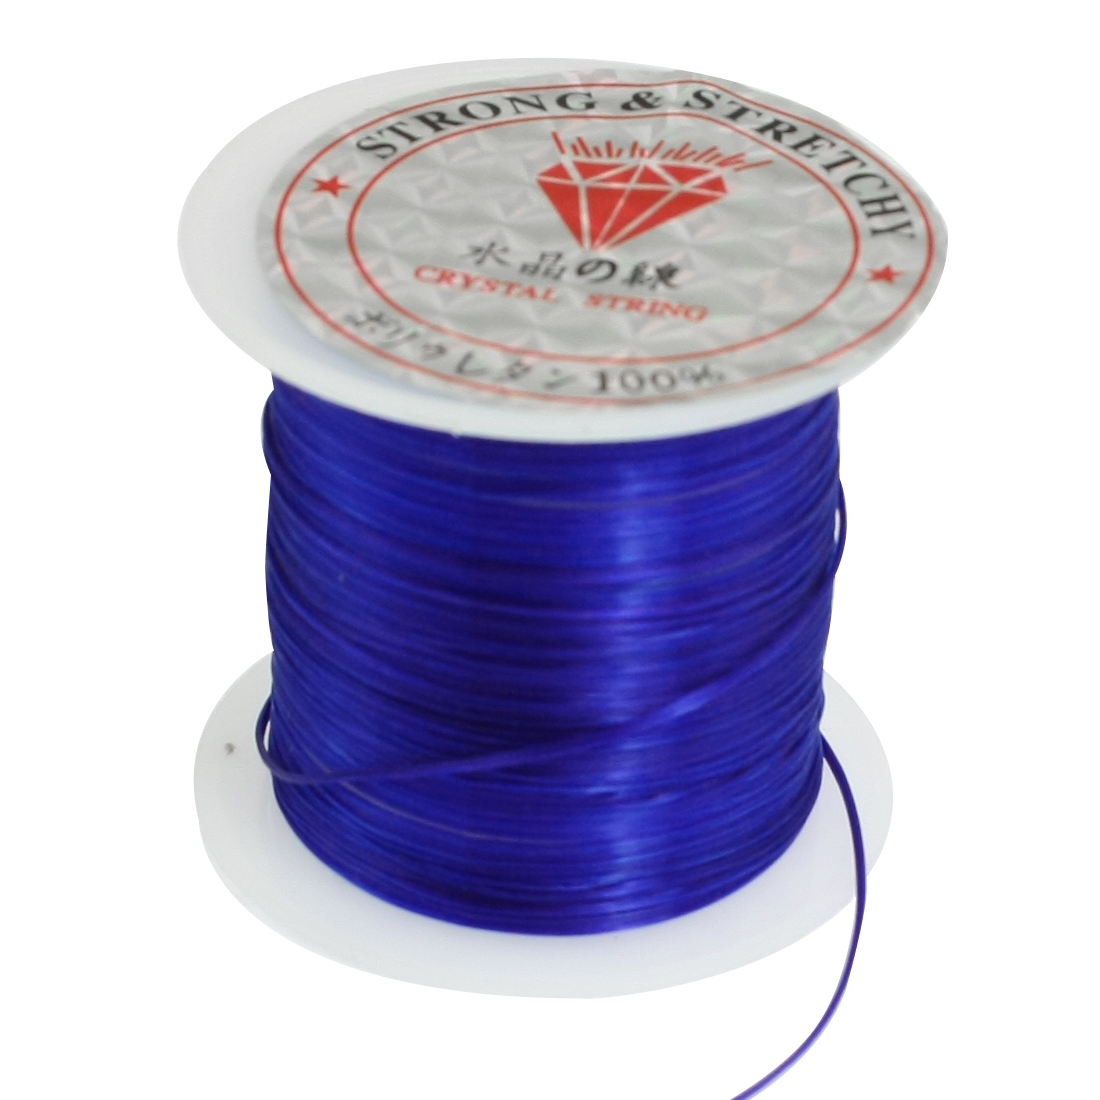 Dark Blue Elastic Crystal String Cord Jewelry Beading Thread Spool 9M 29.5 Ft